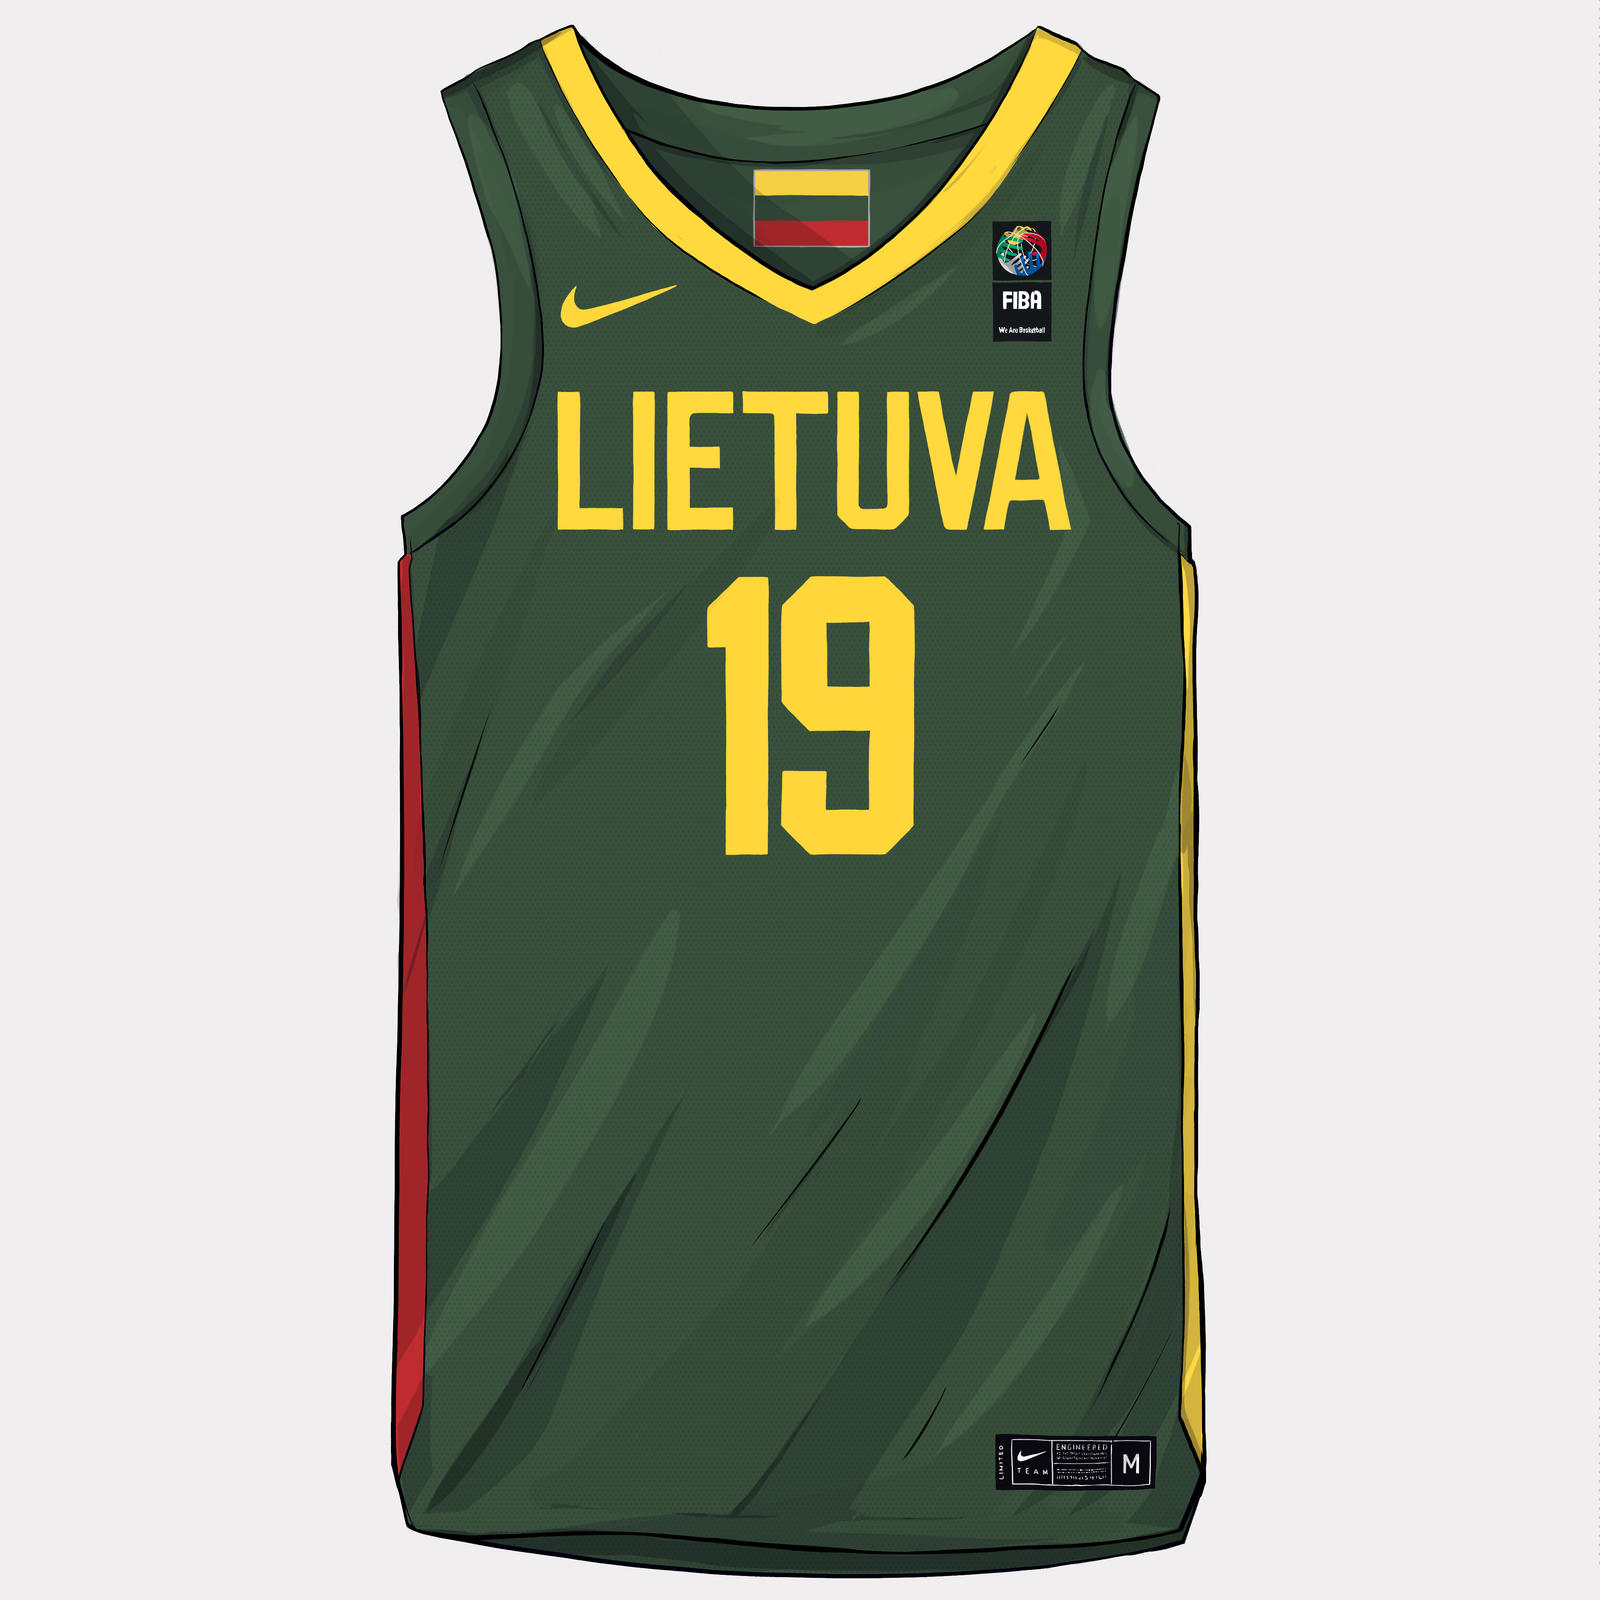 nike-news-lithuania-national-team-kit-2019-illustration-1x1_1_89533.jpg